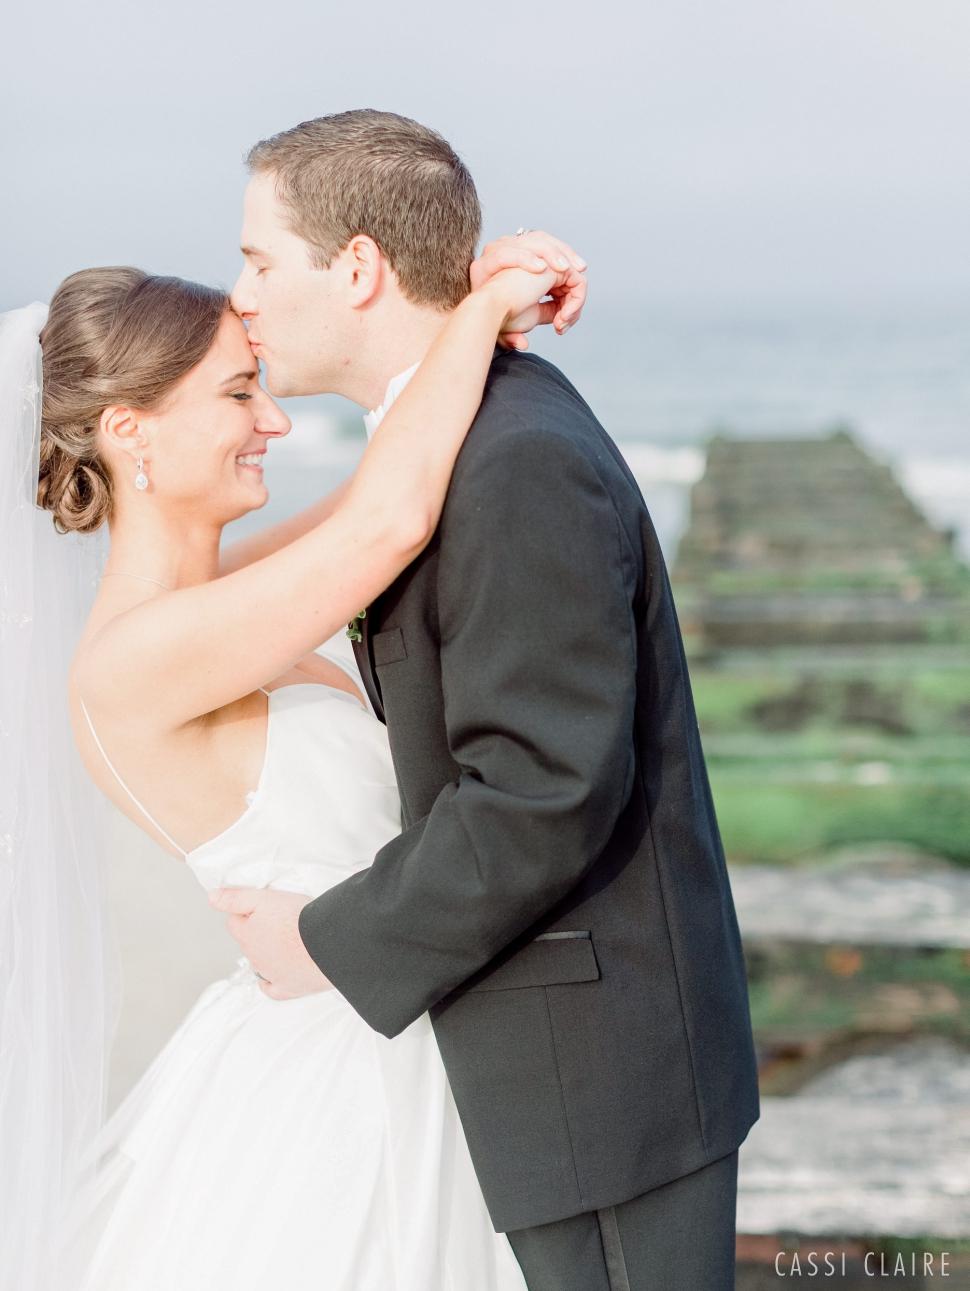 Spring-Lake-Bath-and-Tennis-Club-Wedding-Photos-St-Catherines-Wedding-New-Jersey_23.jpg